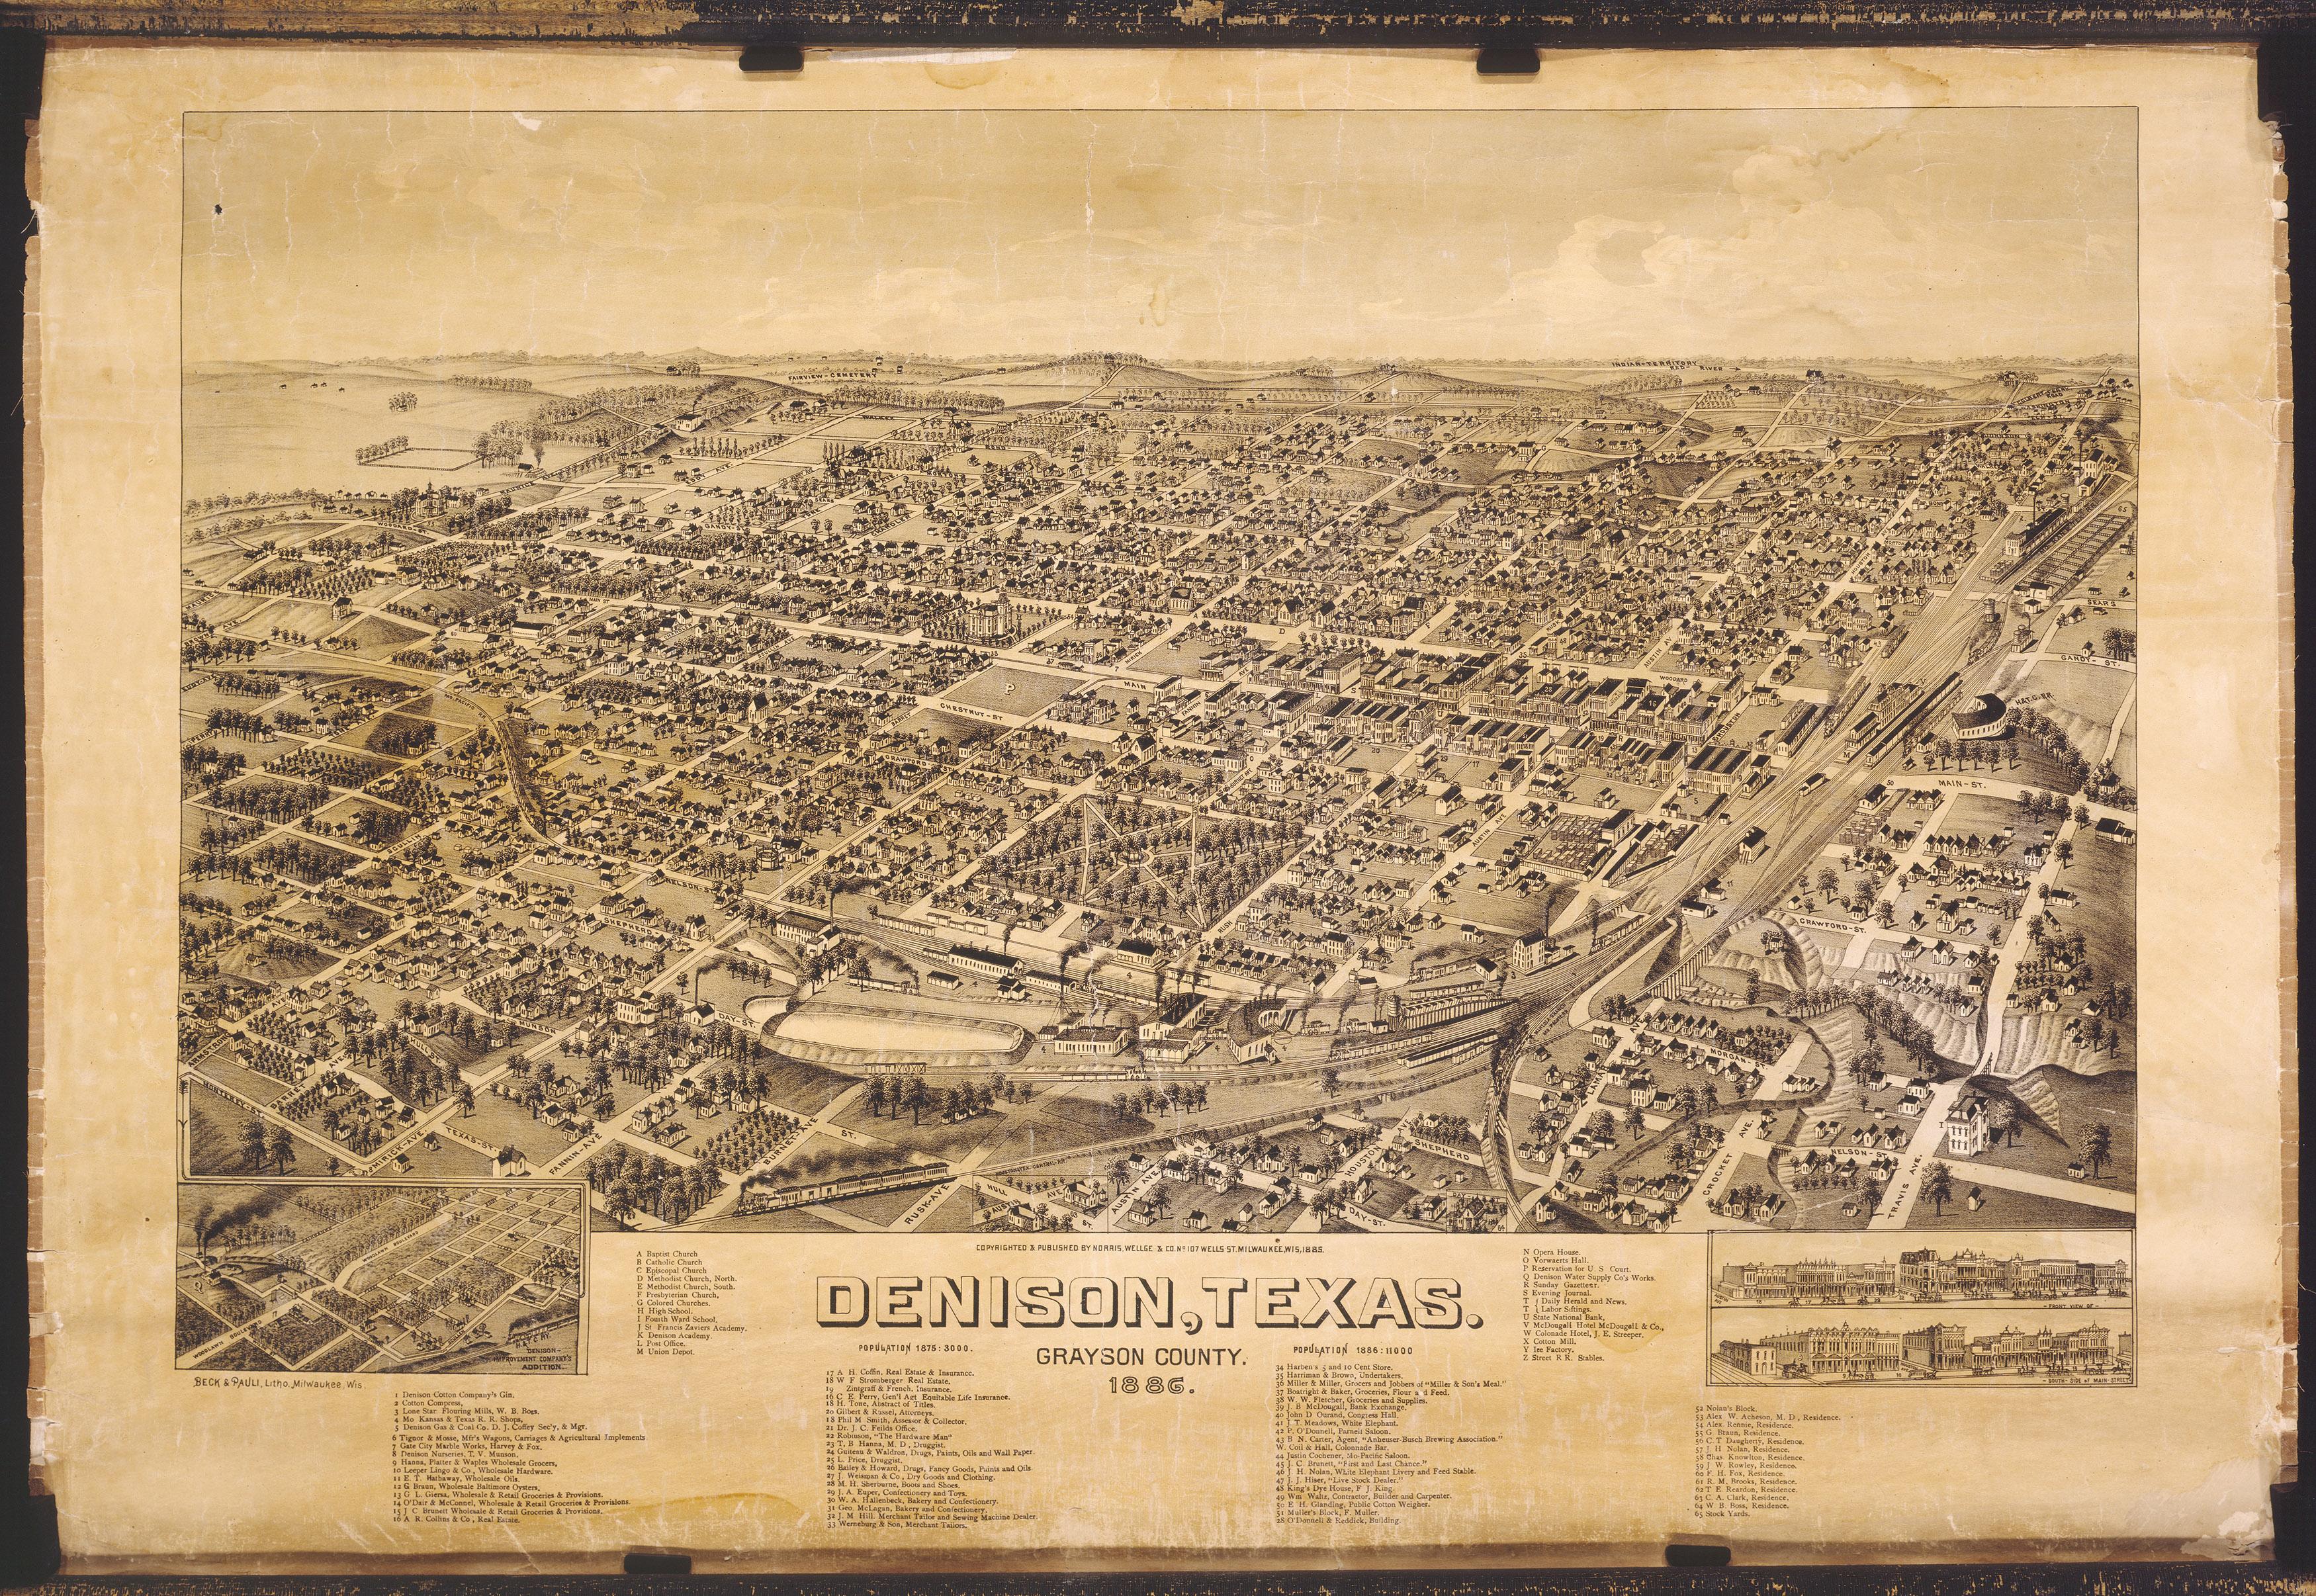 Denison Texas Map on